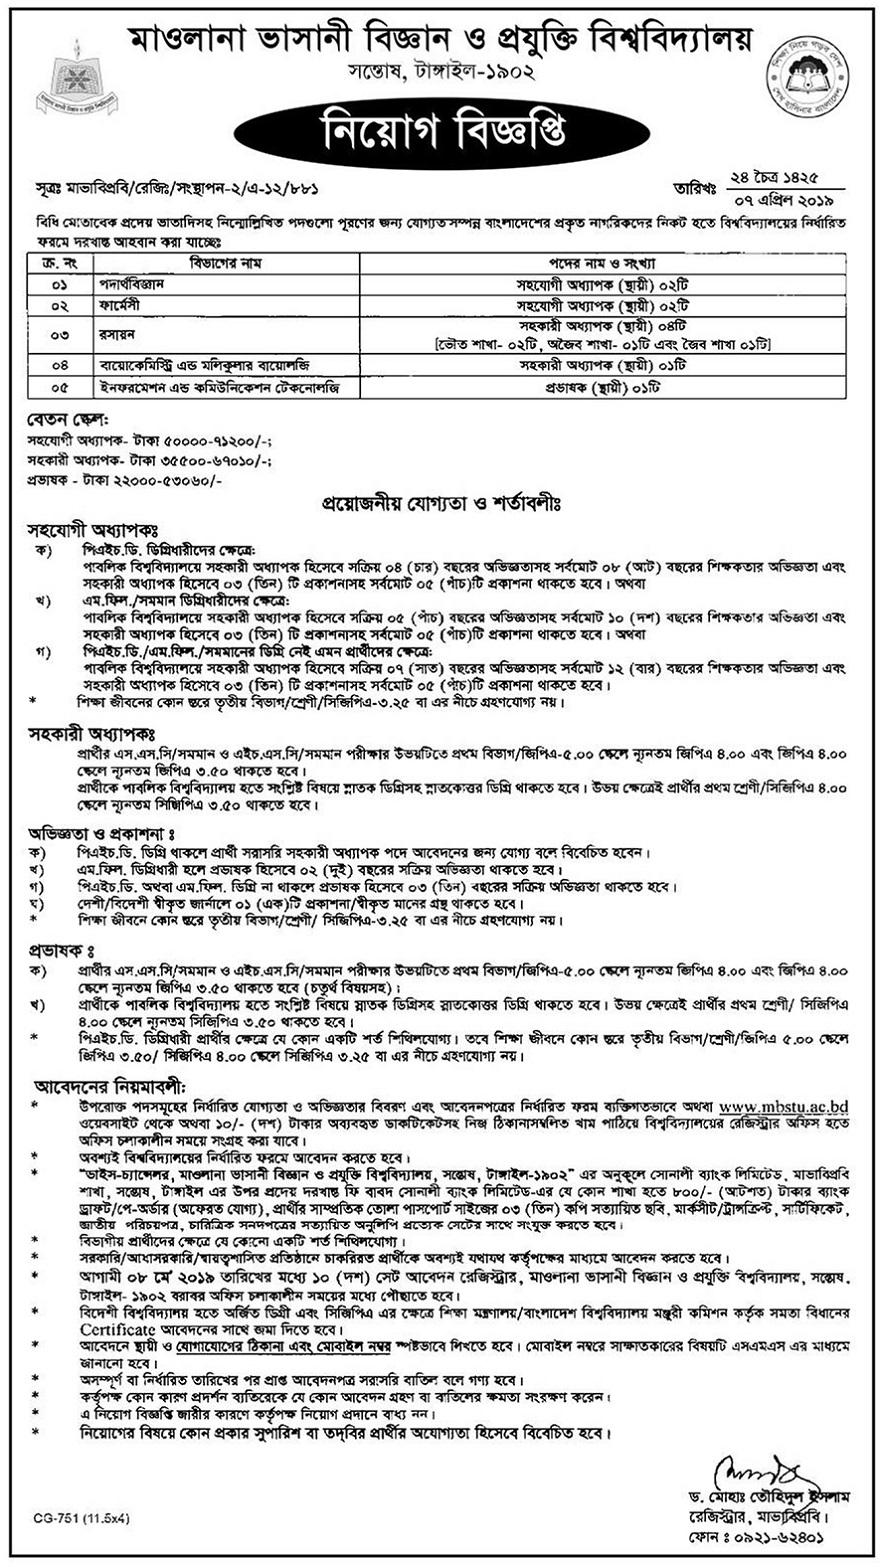 Mawlana Bhashani Science and Technology University Job Circular 2019